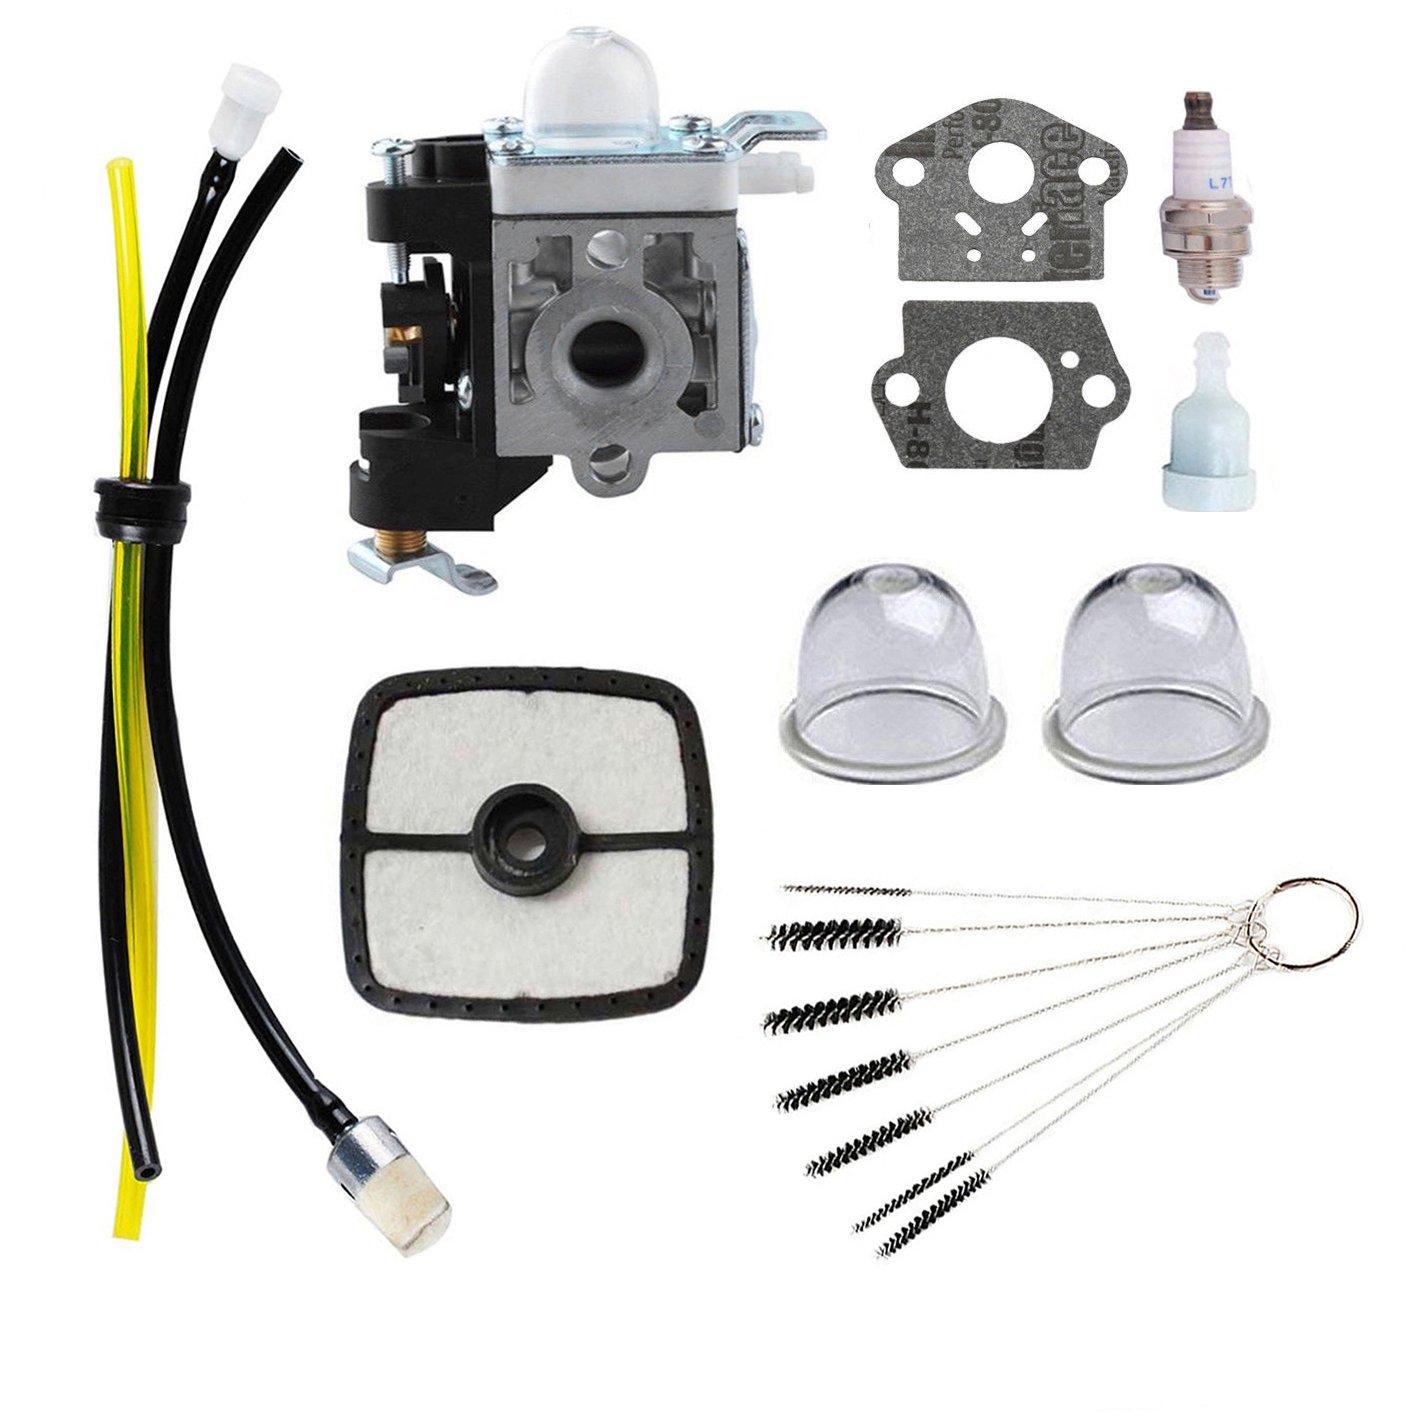 Podoy PB-250 Carburetor Blower for ECHO Parts Tune Up Kit Maintenance Air Filter Fuel PB-250LN A021003661 ES-250 Handheld Power Blower